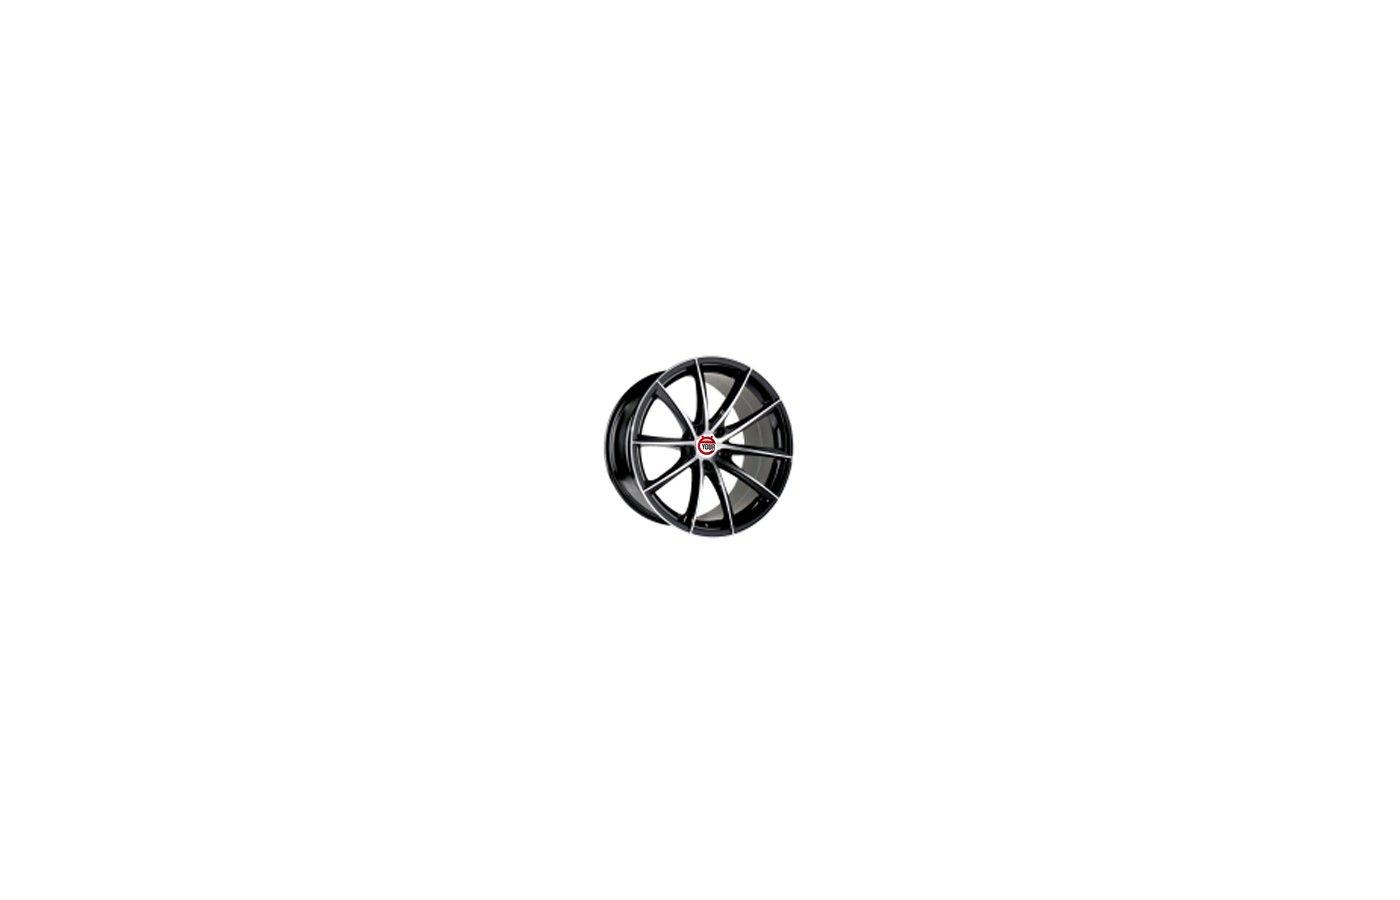 Диск Ё-wheels E16 5.5x14/4x98 D58.6 ET35 BKF